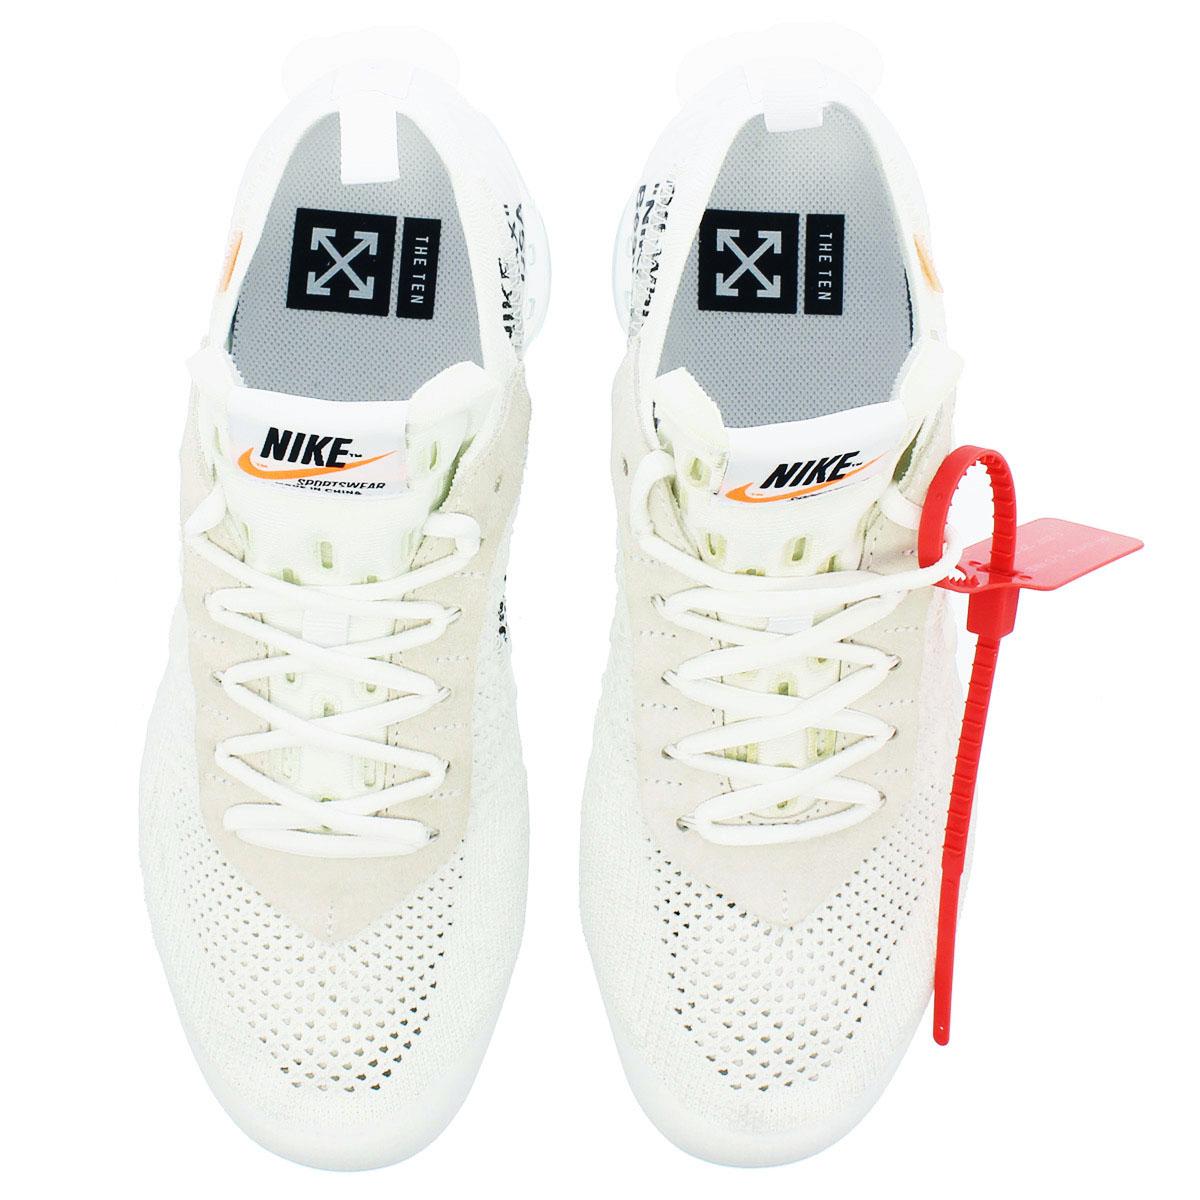 27023cf7149a4 NIKE AIR VAPORMAX FLYKNIT Nike air vapor max fried food knit WHITE TOTAL  CRIMSON BLACK